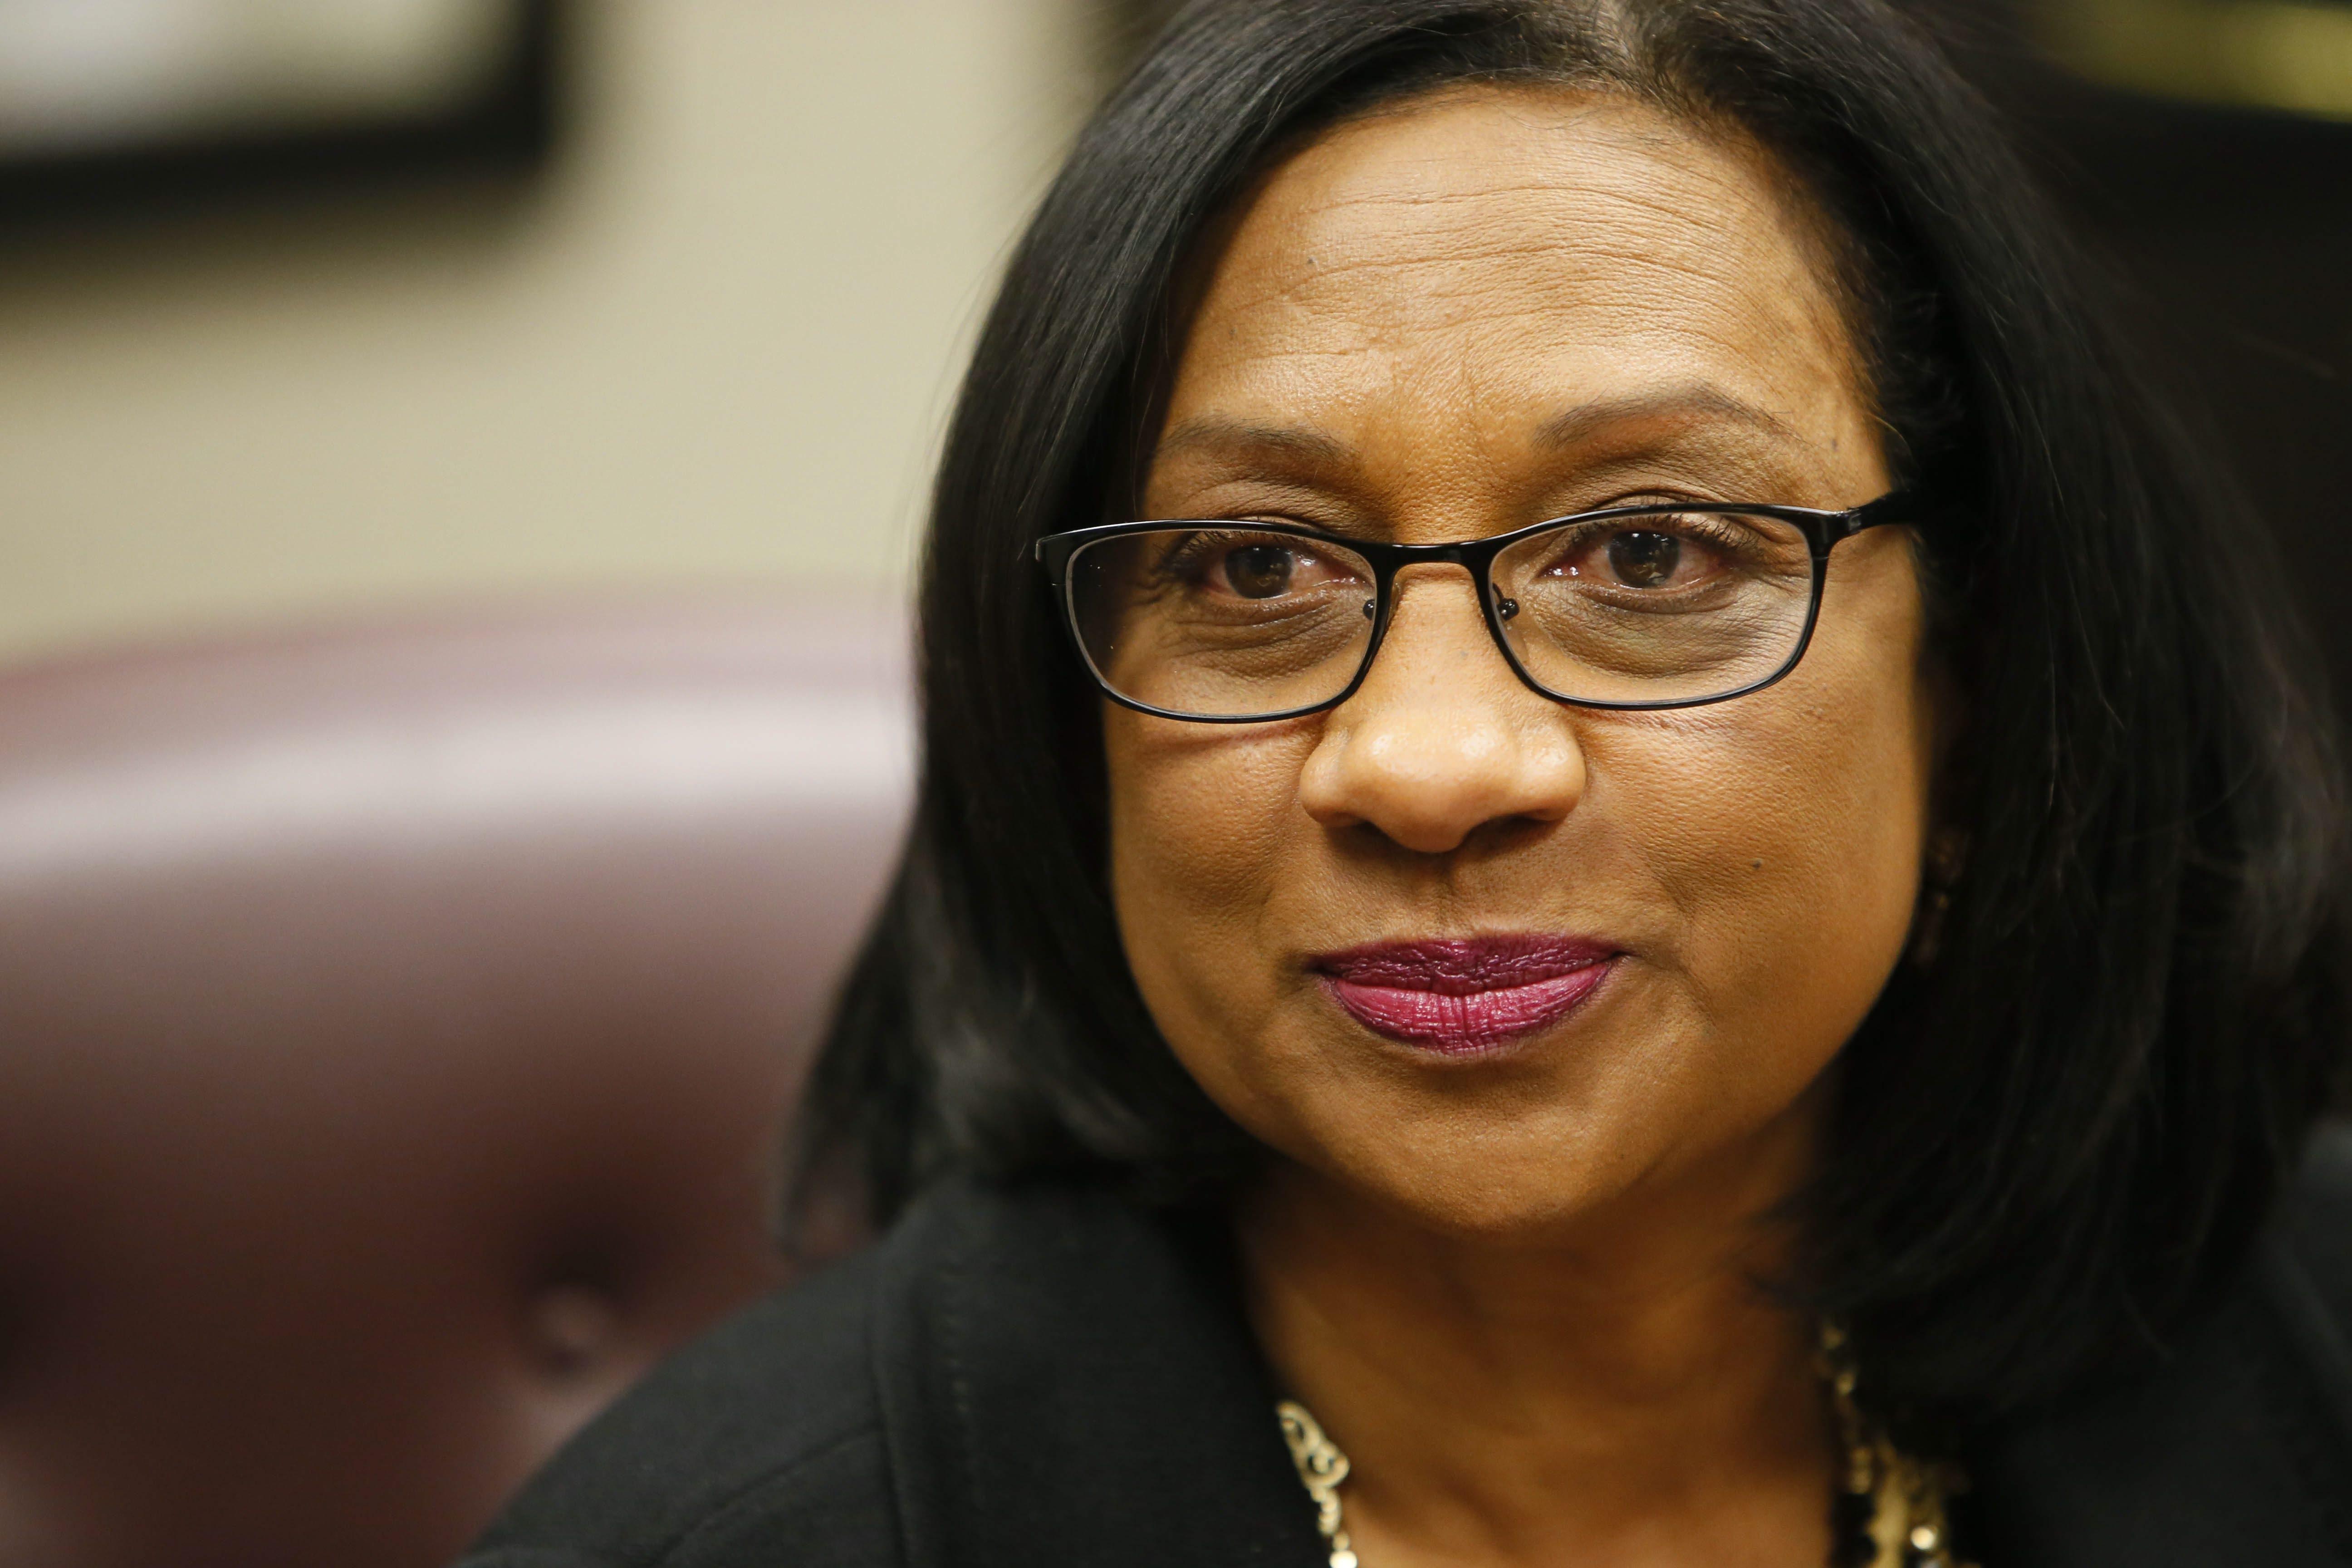 The Buffalo School Board has agreed on a separation agreement for Pamela Brown exeeding $238,000.  (Derek Gee/Buffalo News file photo)